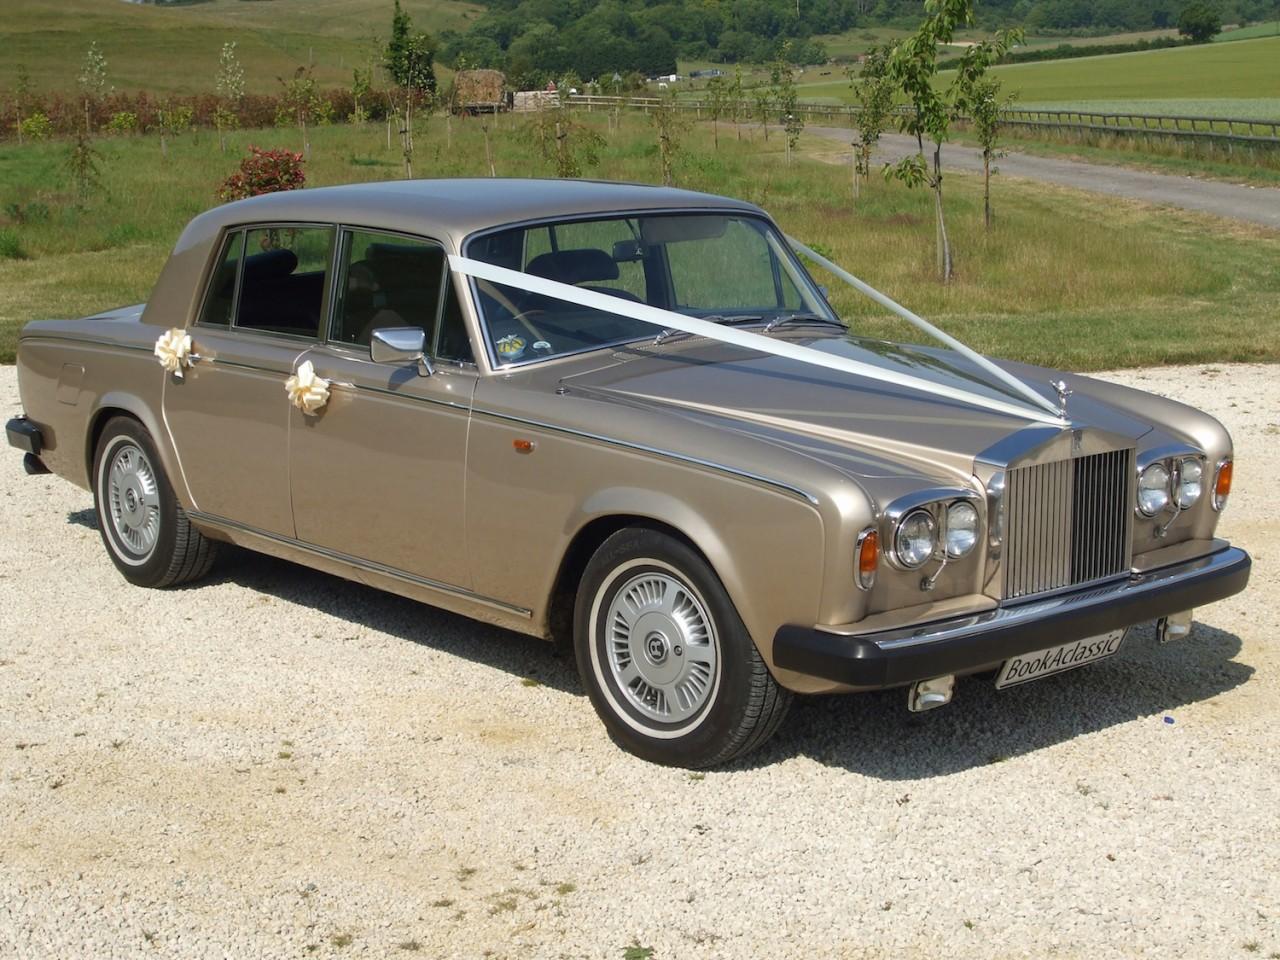 Rolls Royce Silver Shadow II Hire Worthing